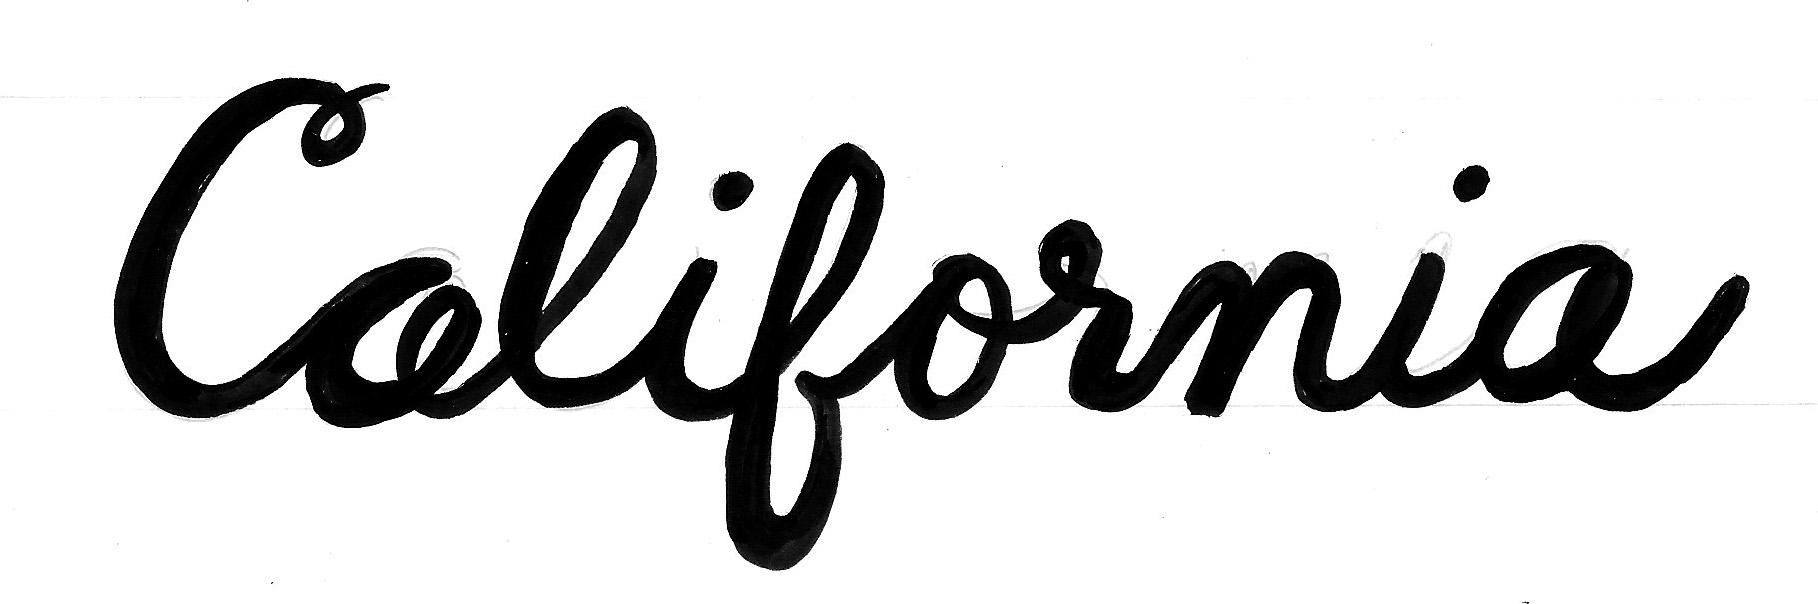 California Sketch